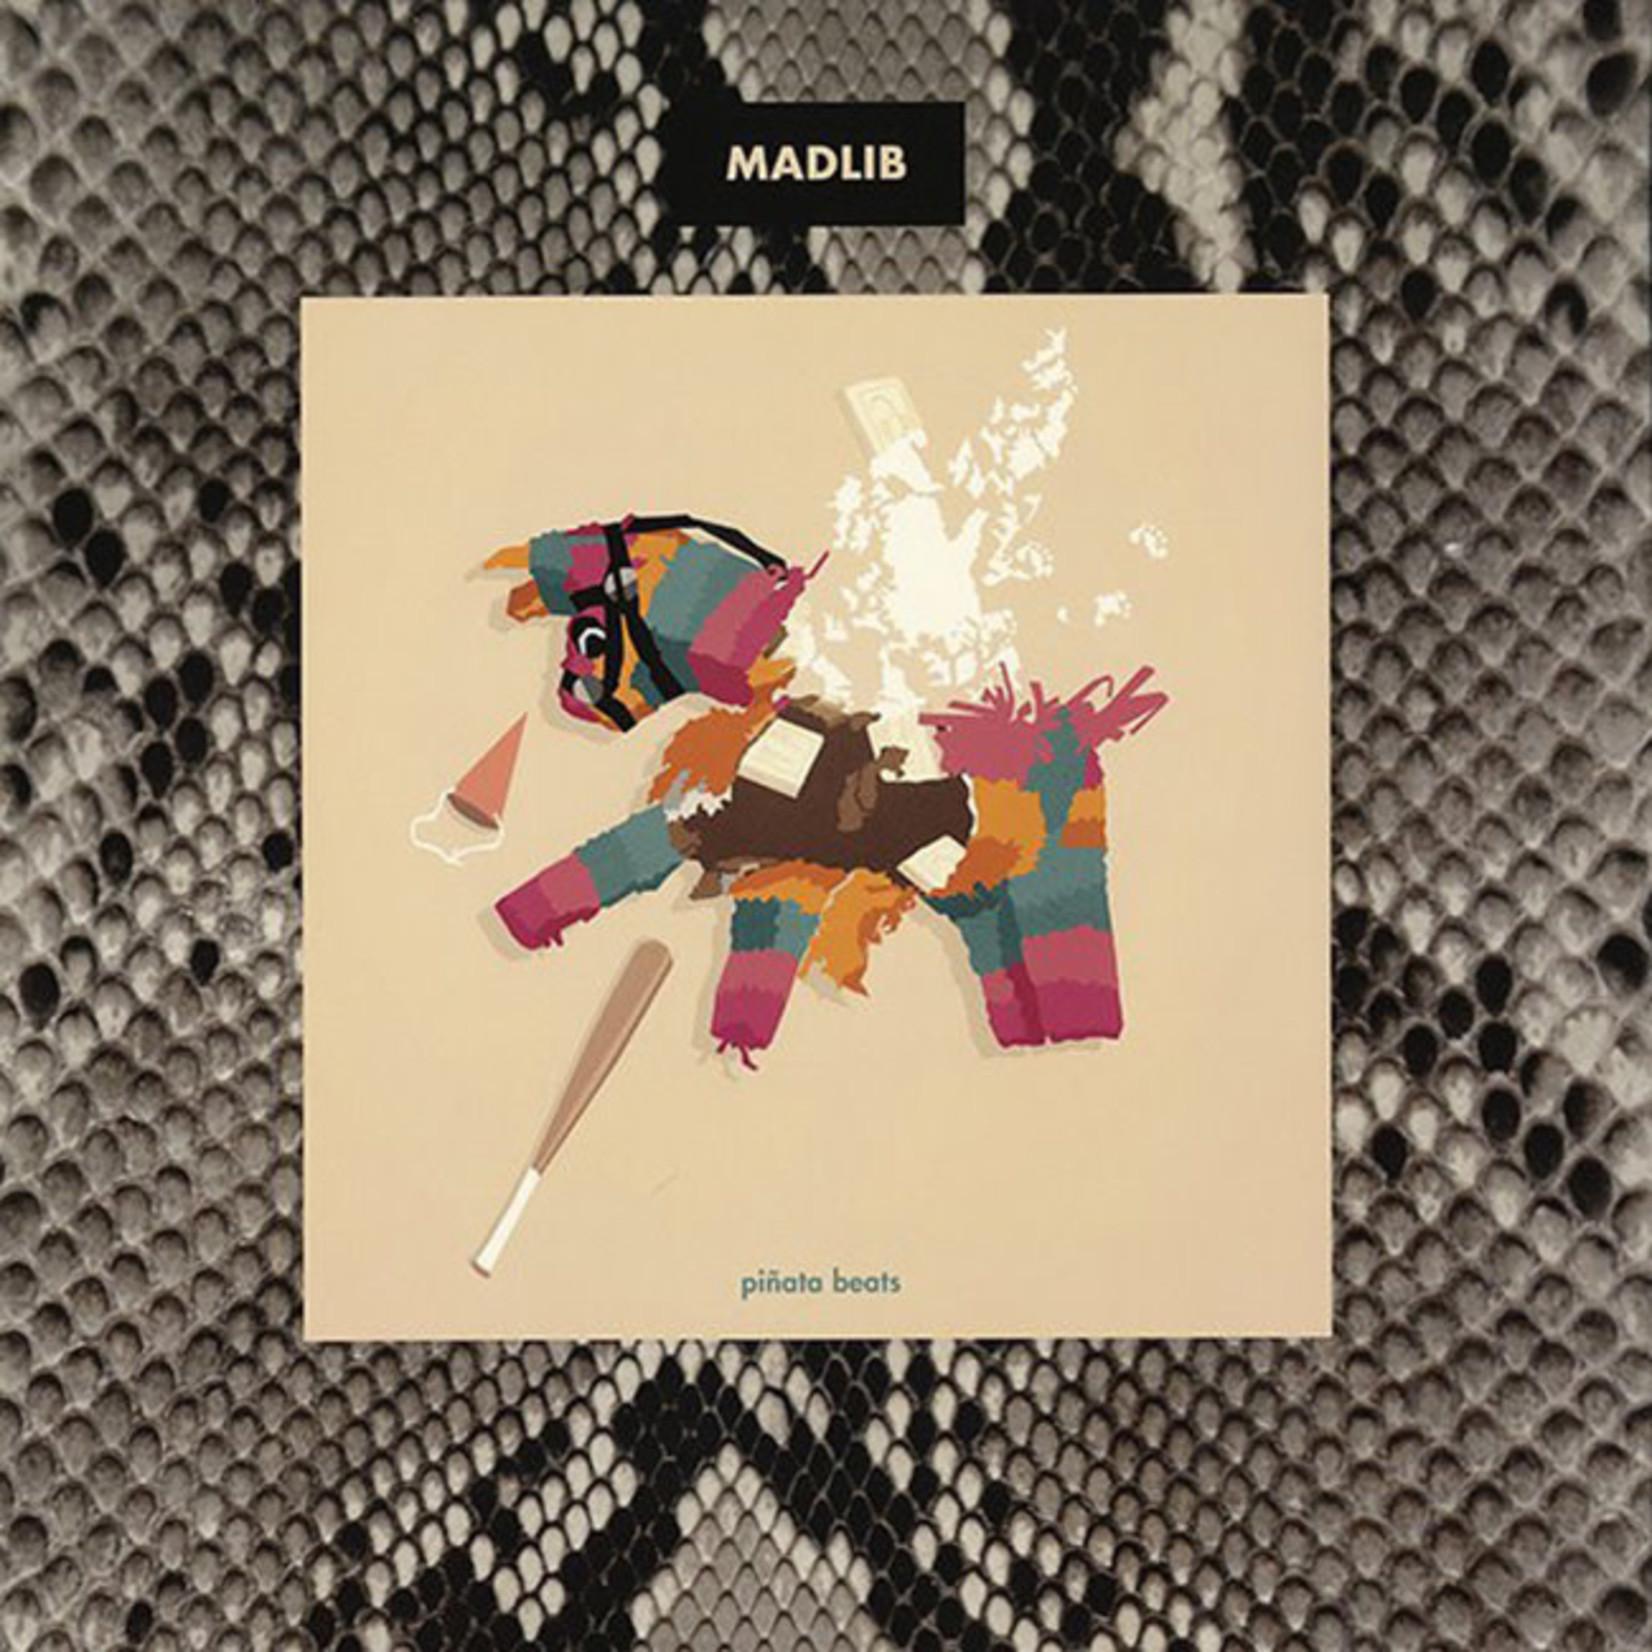 [New] Madlib & Freddie Gibbs: Pinata Beats (2LP)